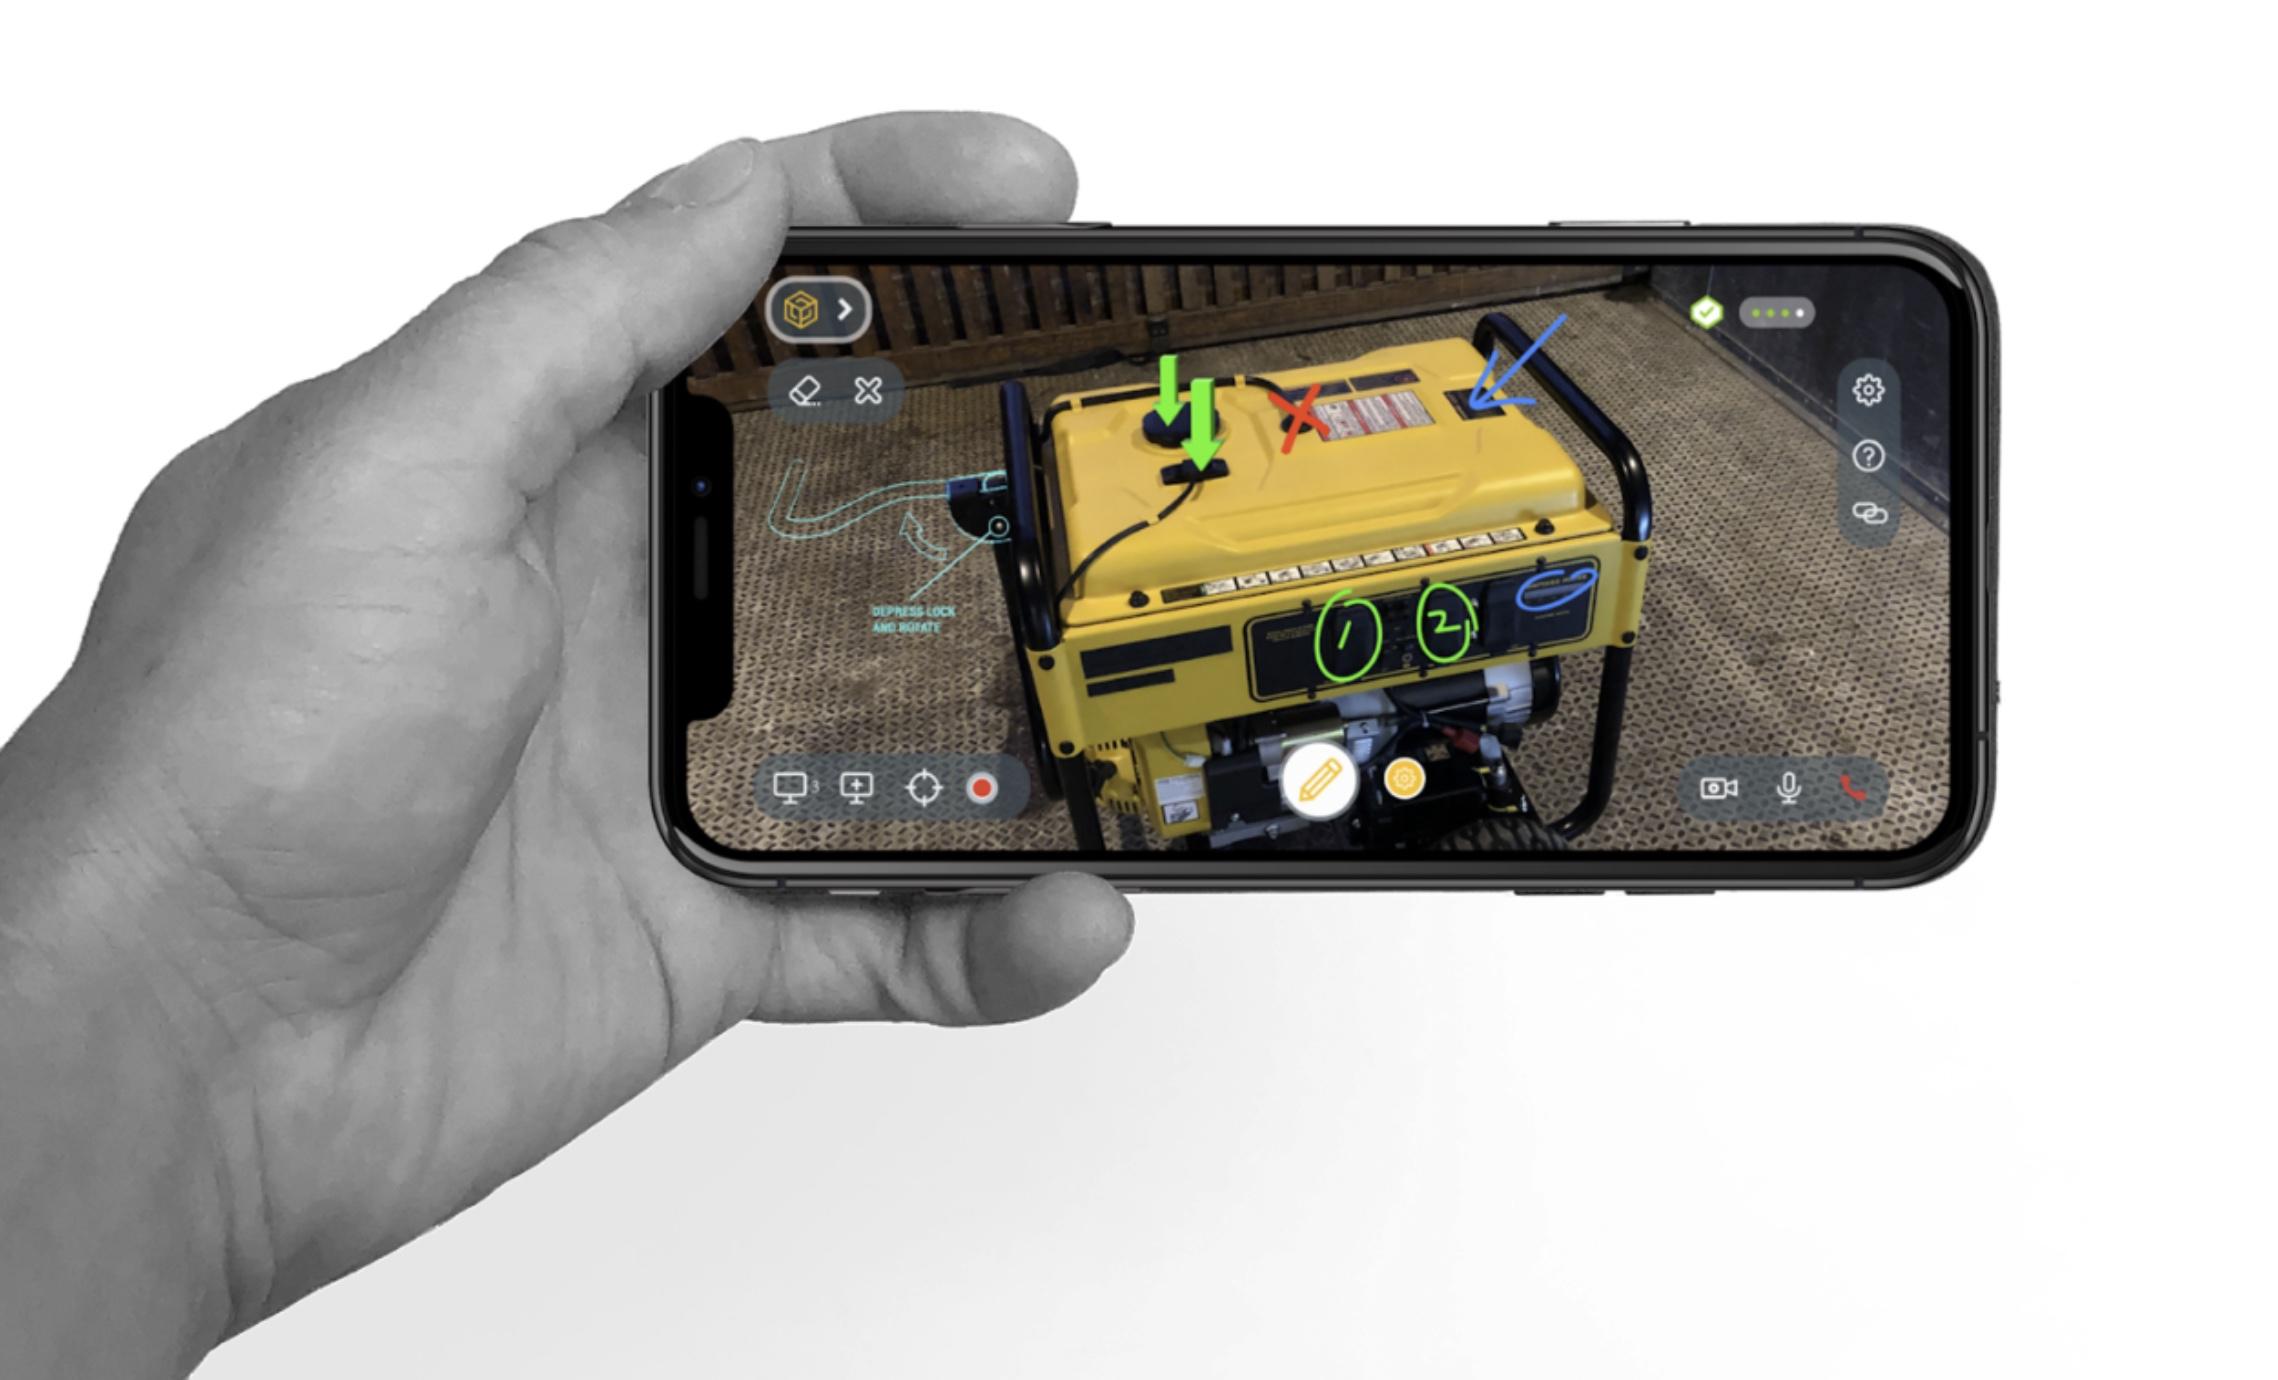 Scope AR on mobile